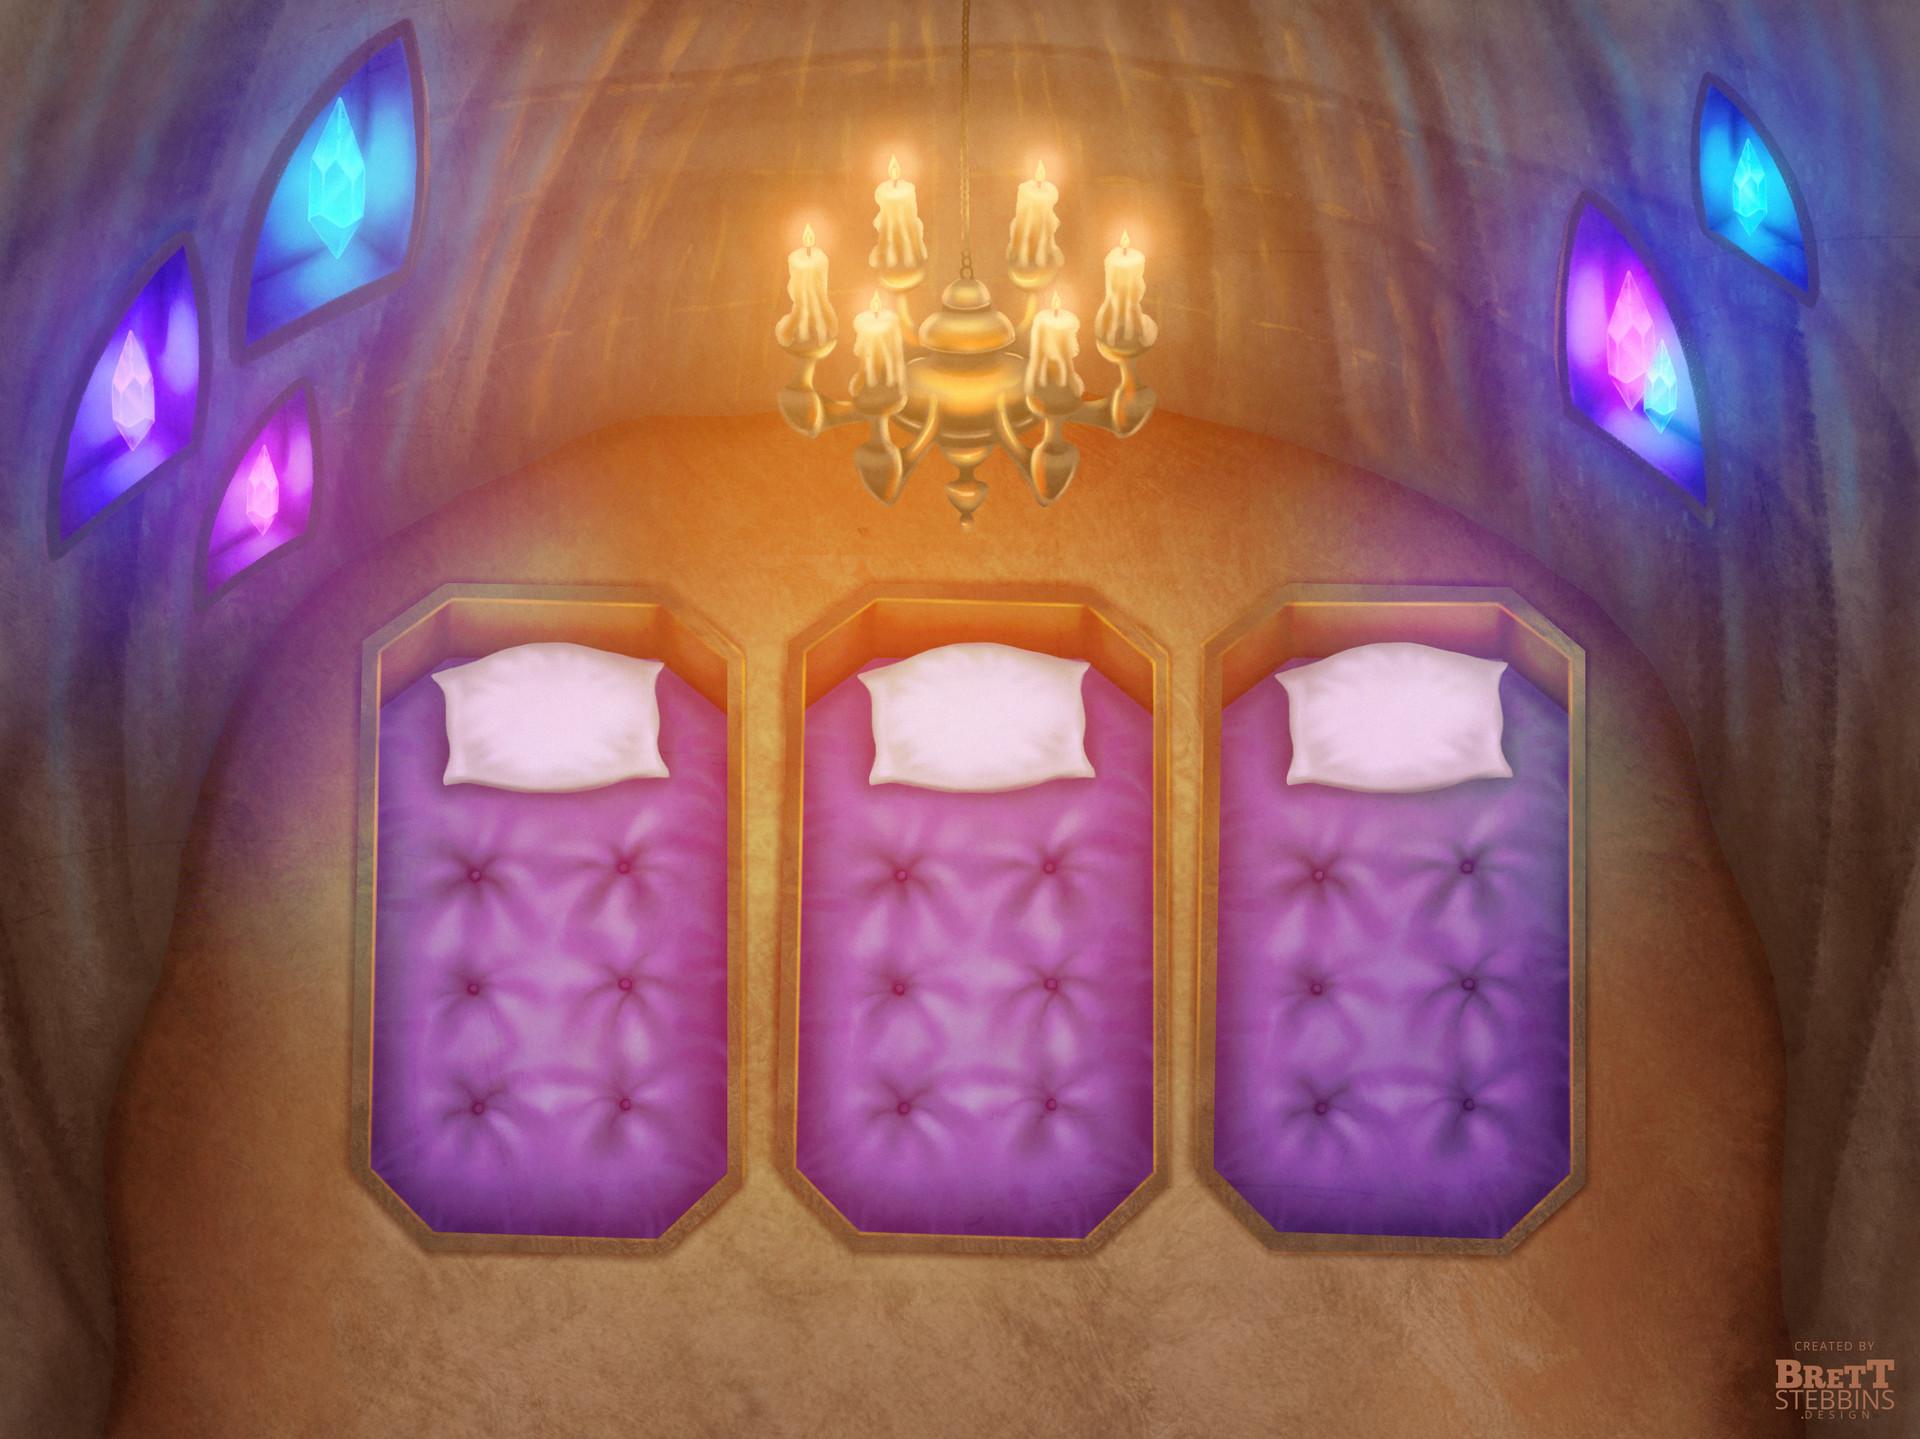 Brett stebbins vampire house sleeping chamber 02